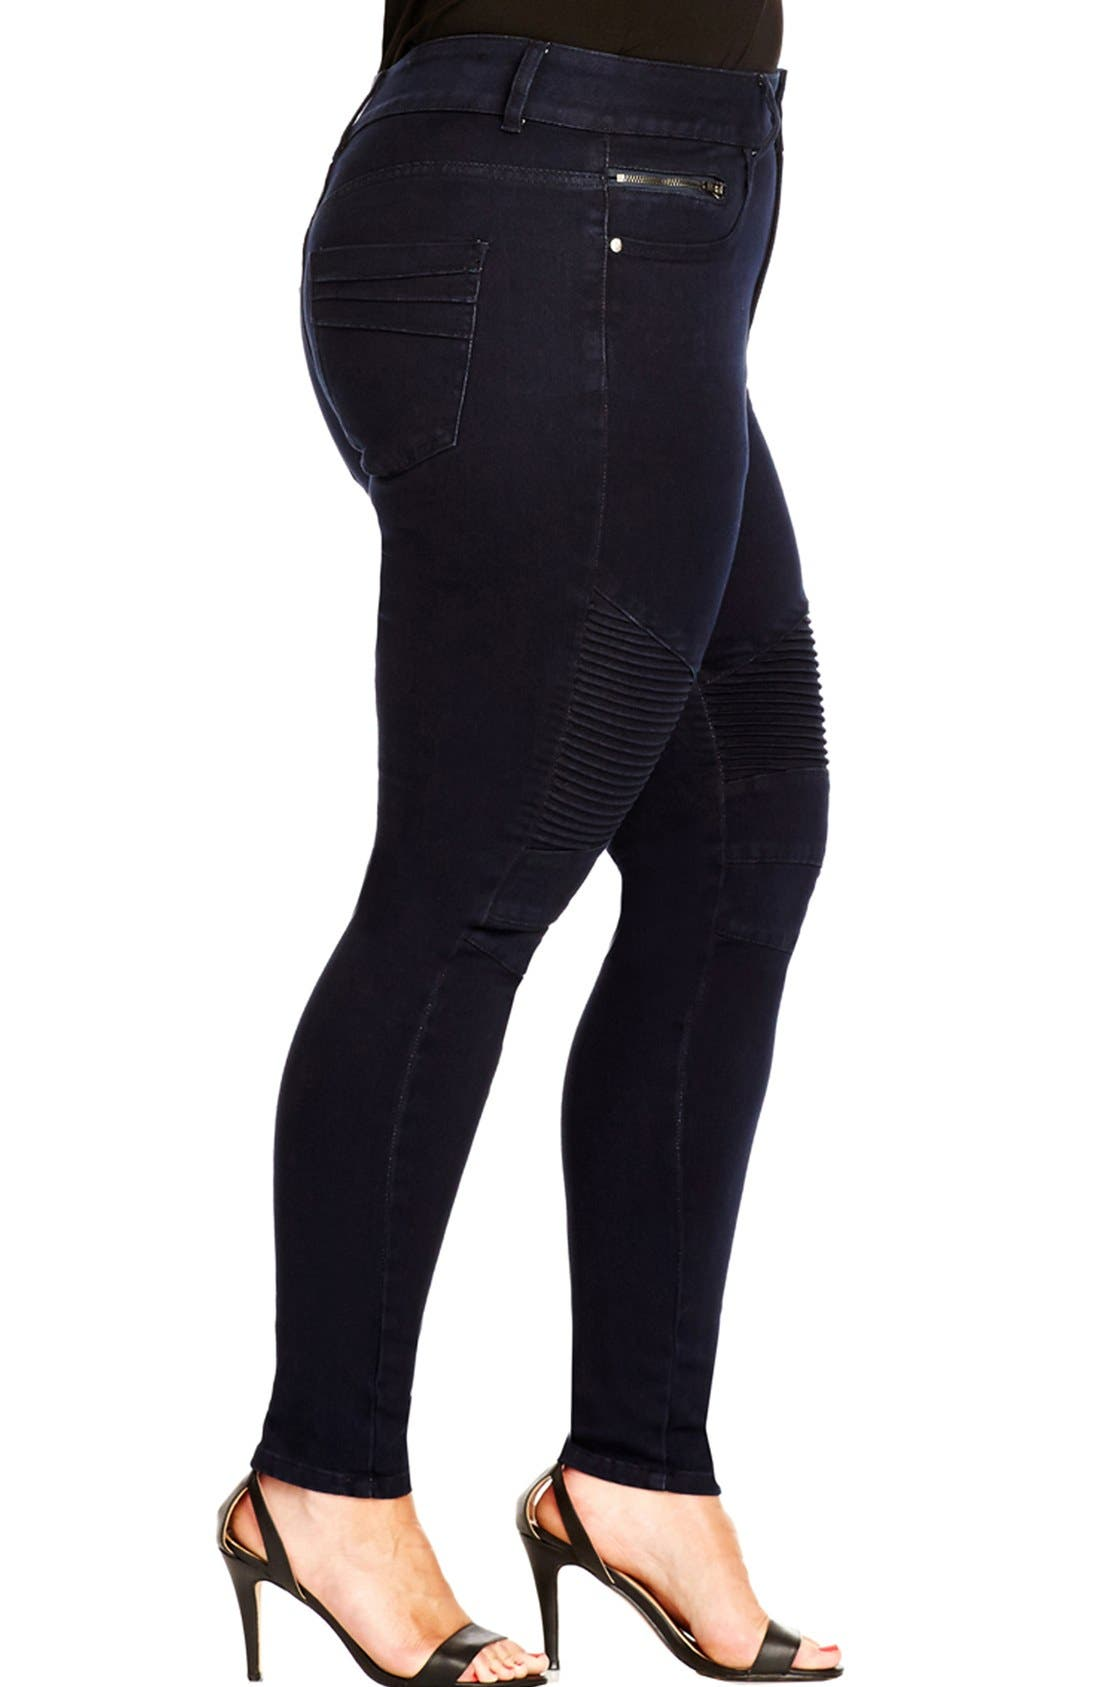 Alternate Image 3  - City Chic 'Moto' Stretch Skinny Jeans (Dark Denim) (Plus Size)